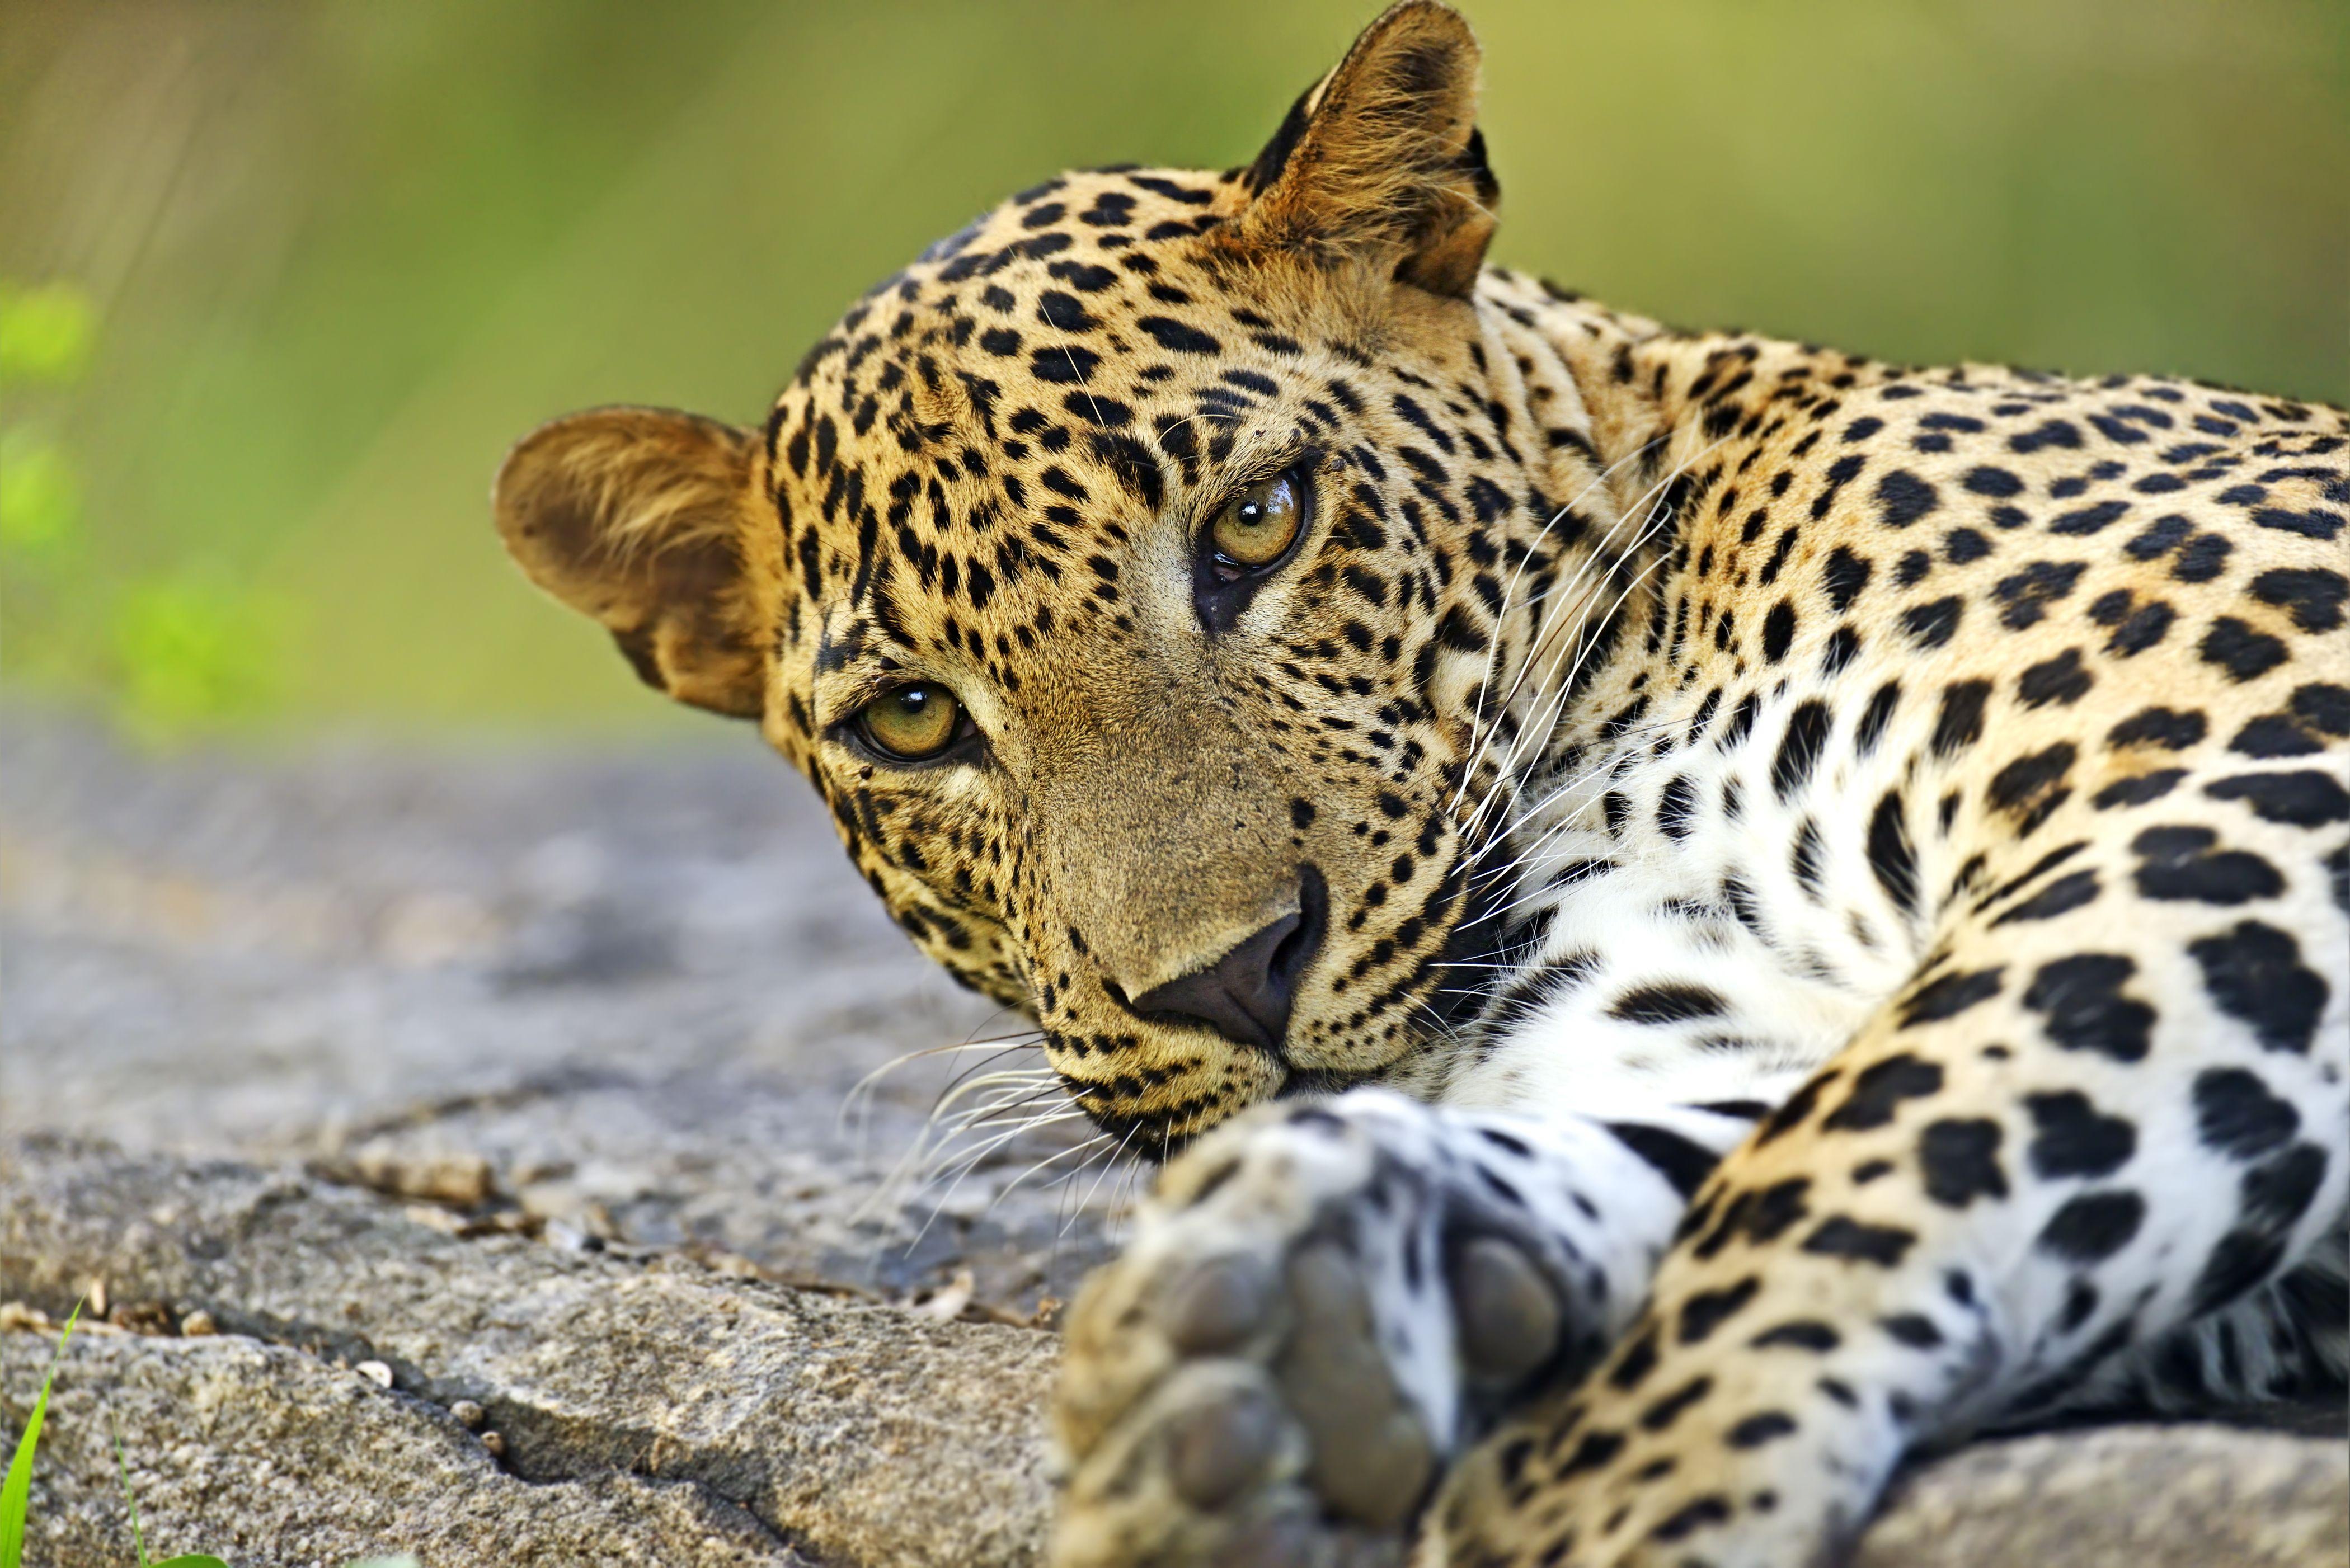 Sri Lanka Wildlife Tour This Guided Tour Is A Superb